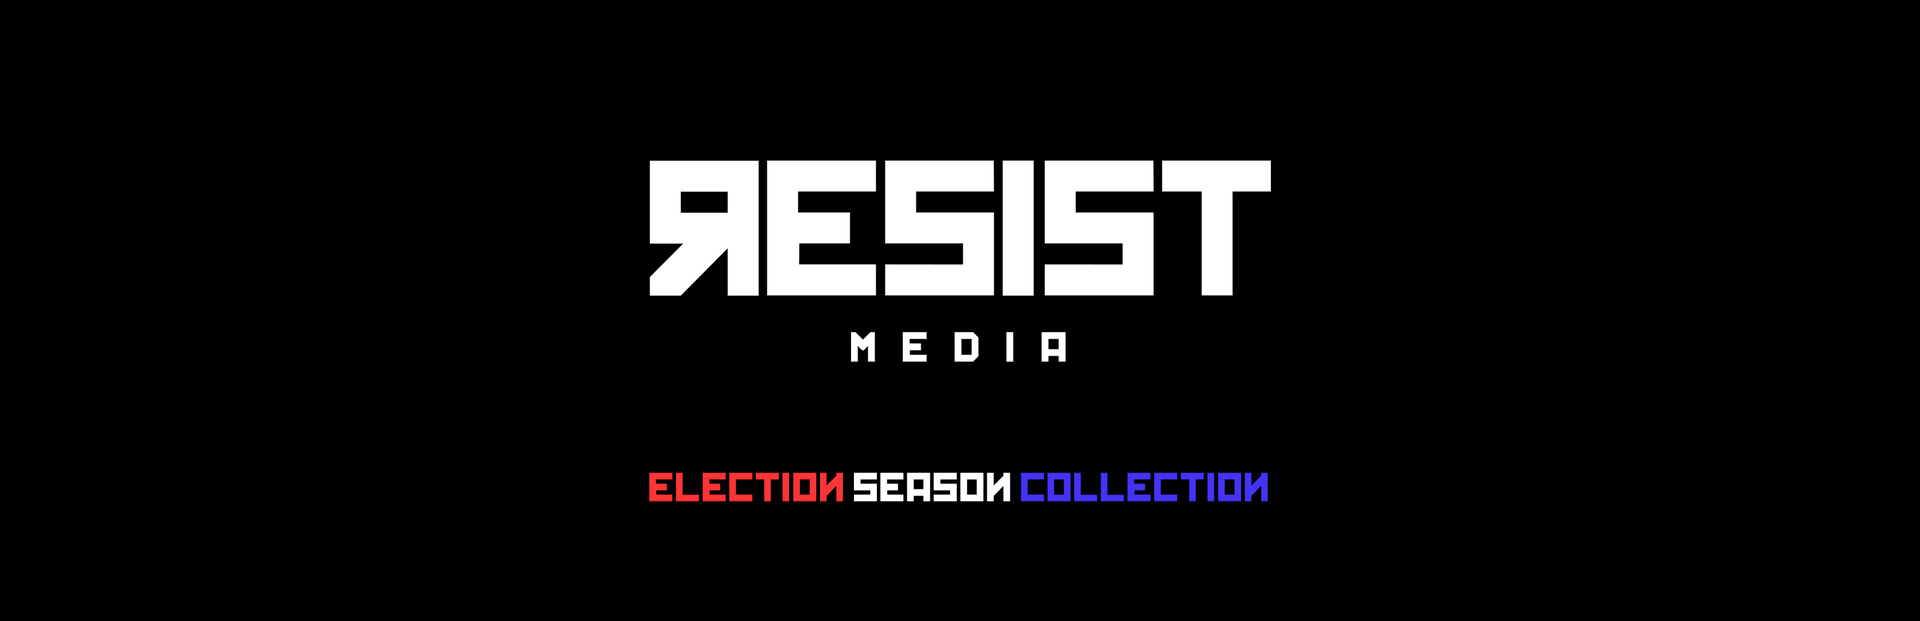 Resist Media Store